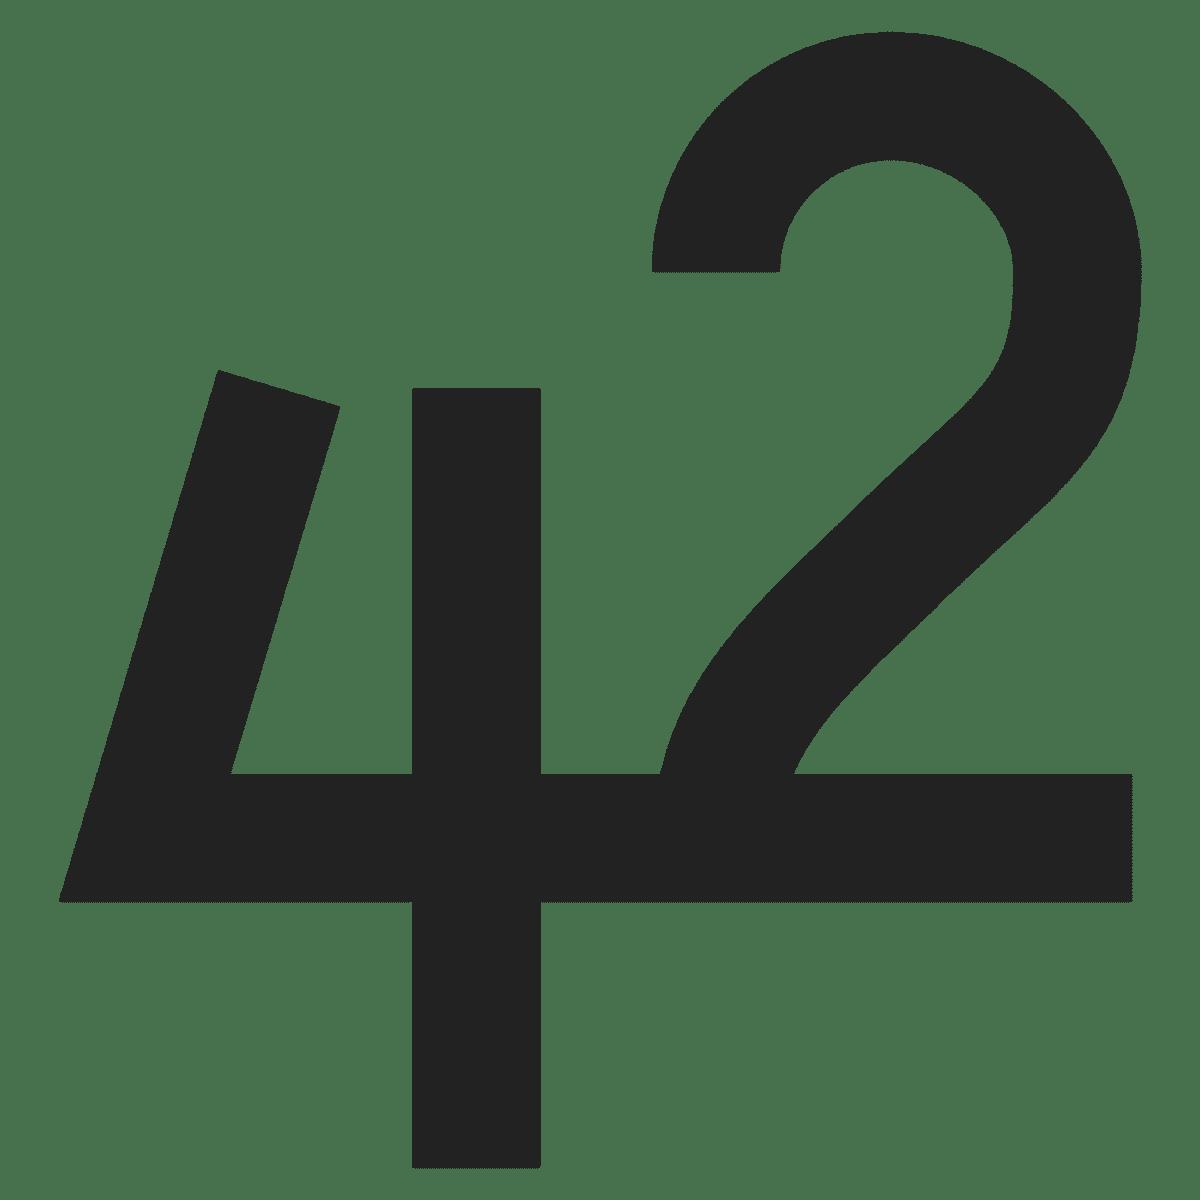 42 Technologies Inc.